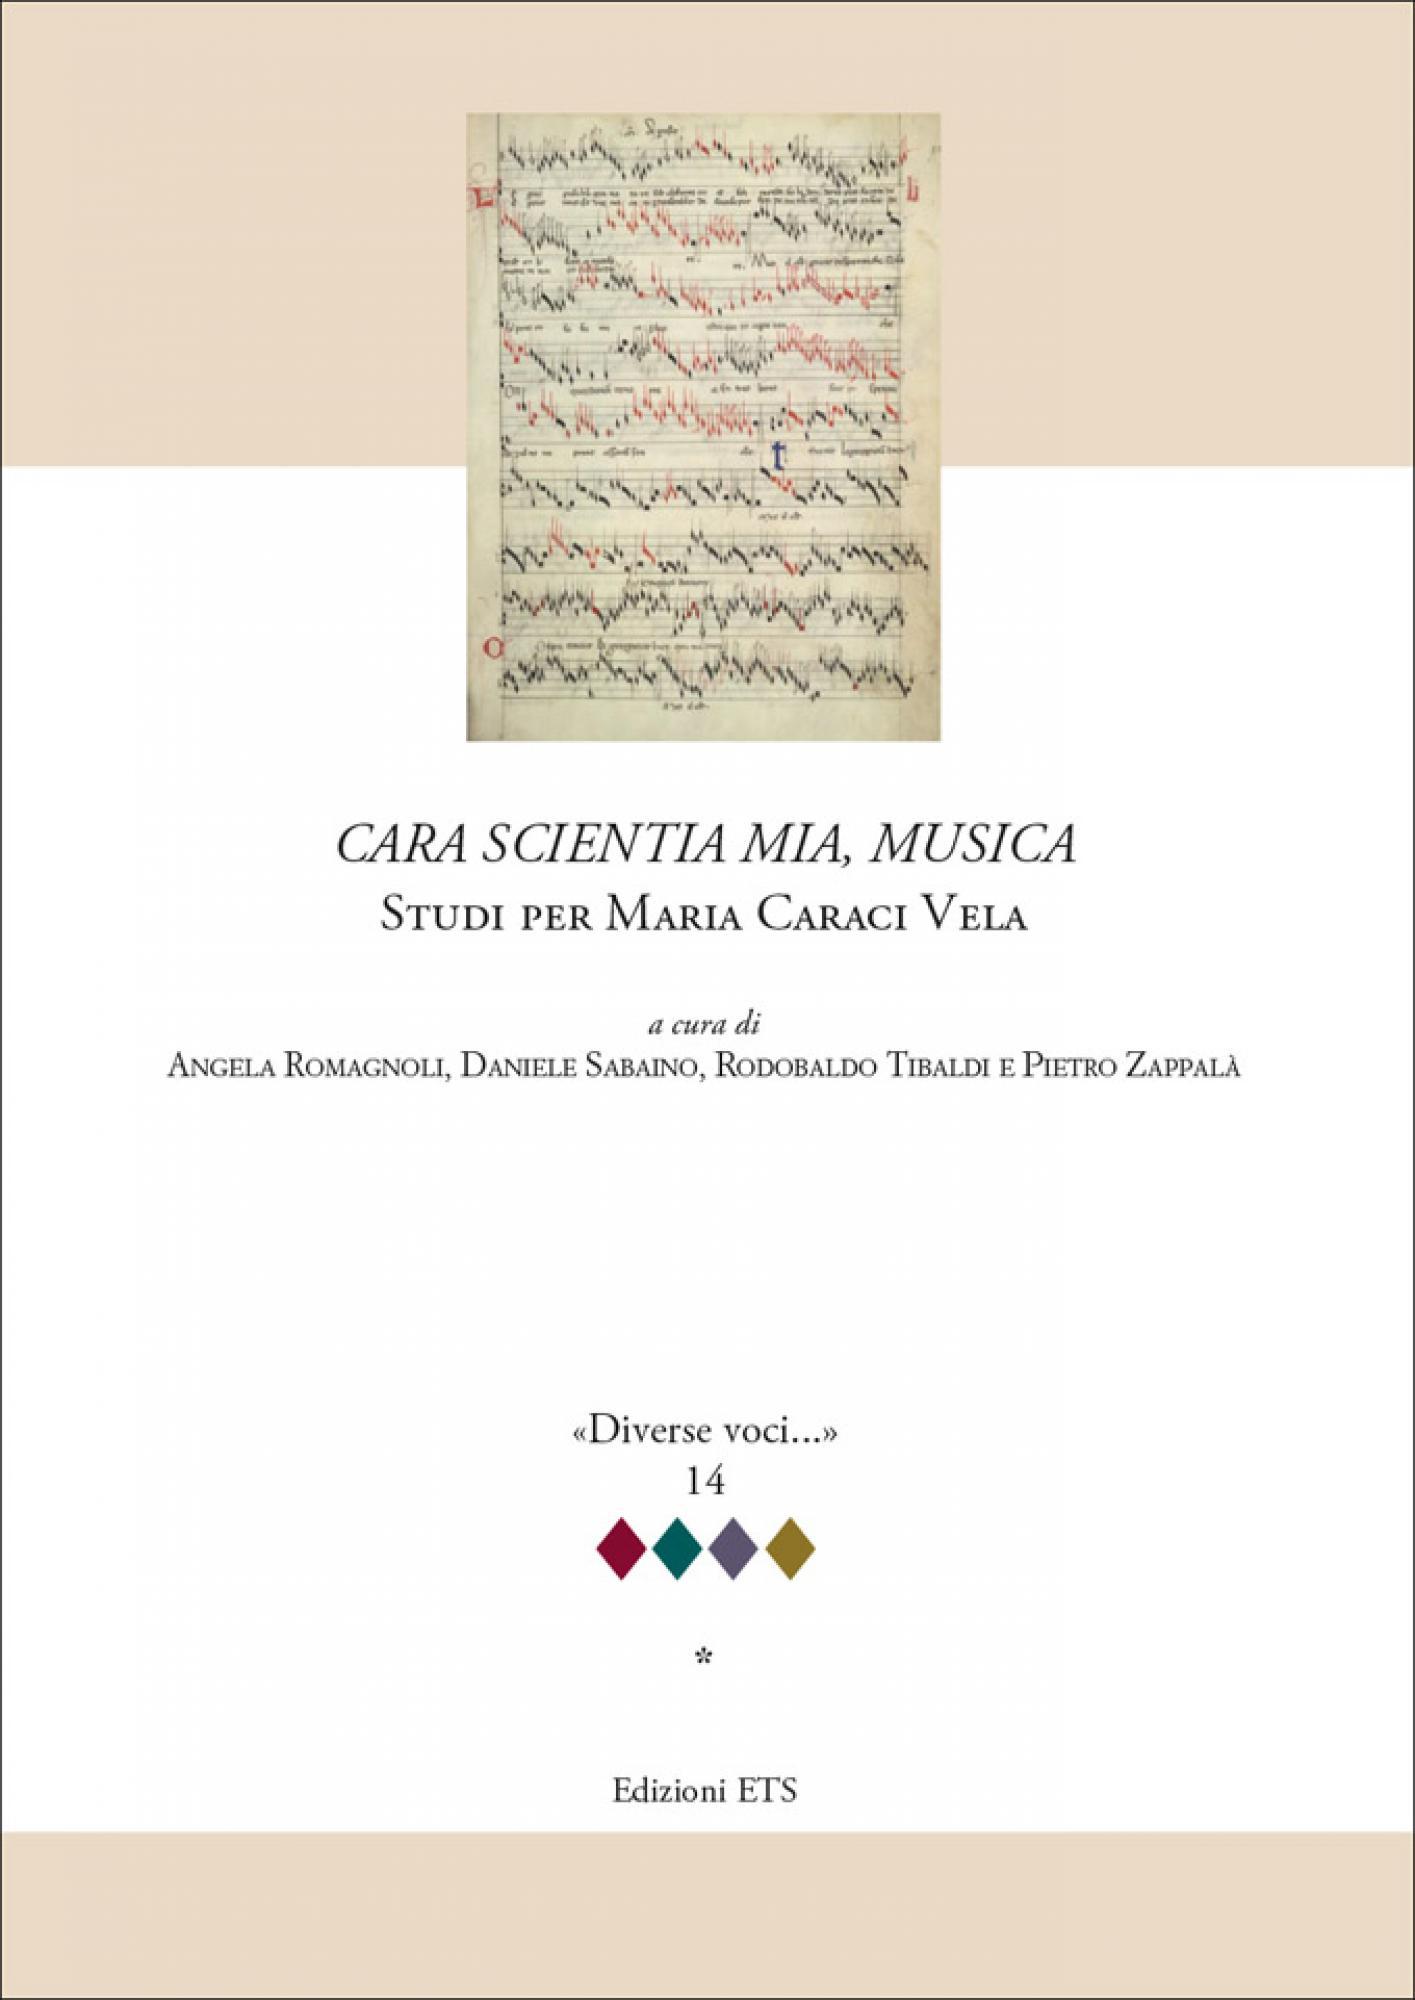 <em>Cara scientia mia, musica</em>.Studi per Maria Caraci Vela